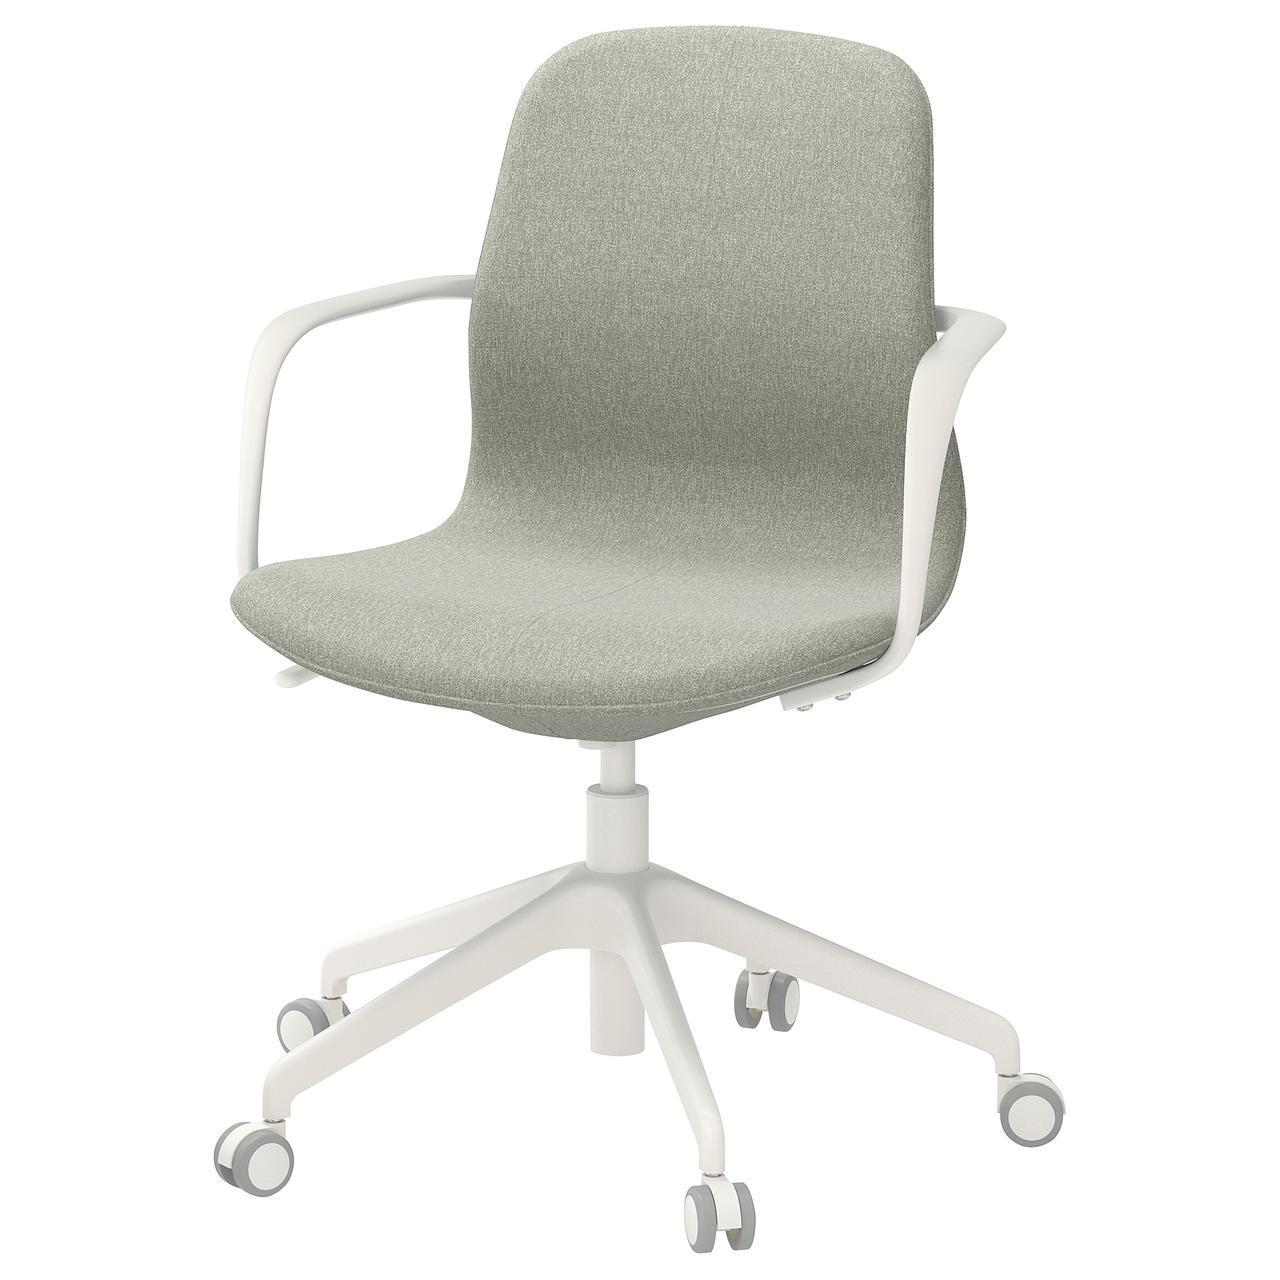 IKEA LANGFJALL Рабочий стул, светло-зеленый, белый  (192.527.81)